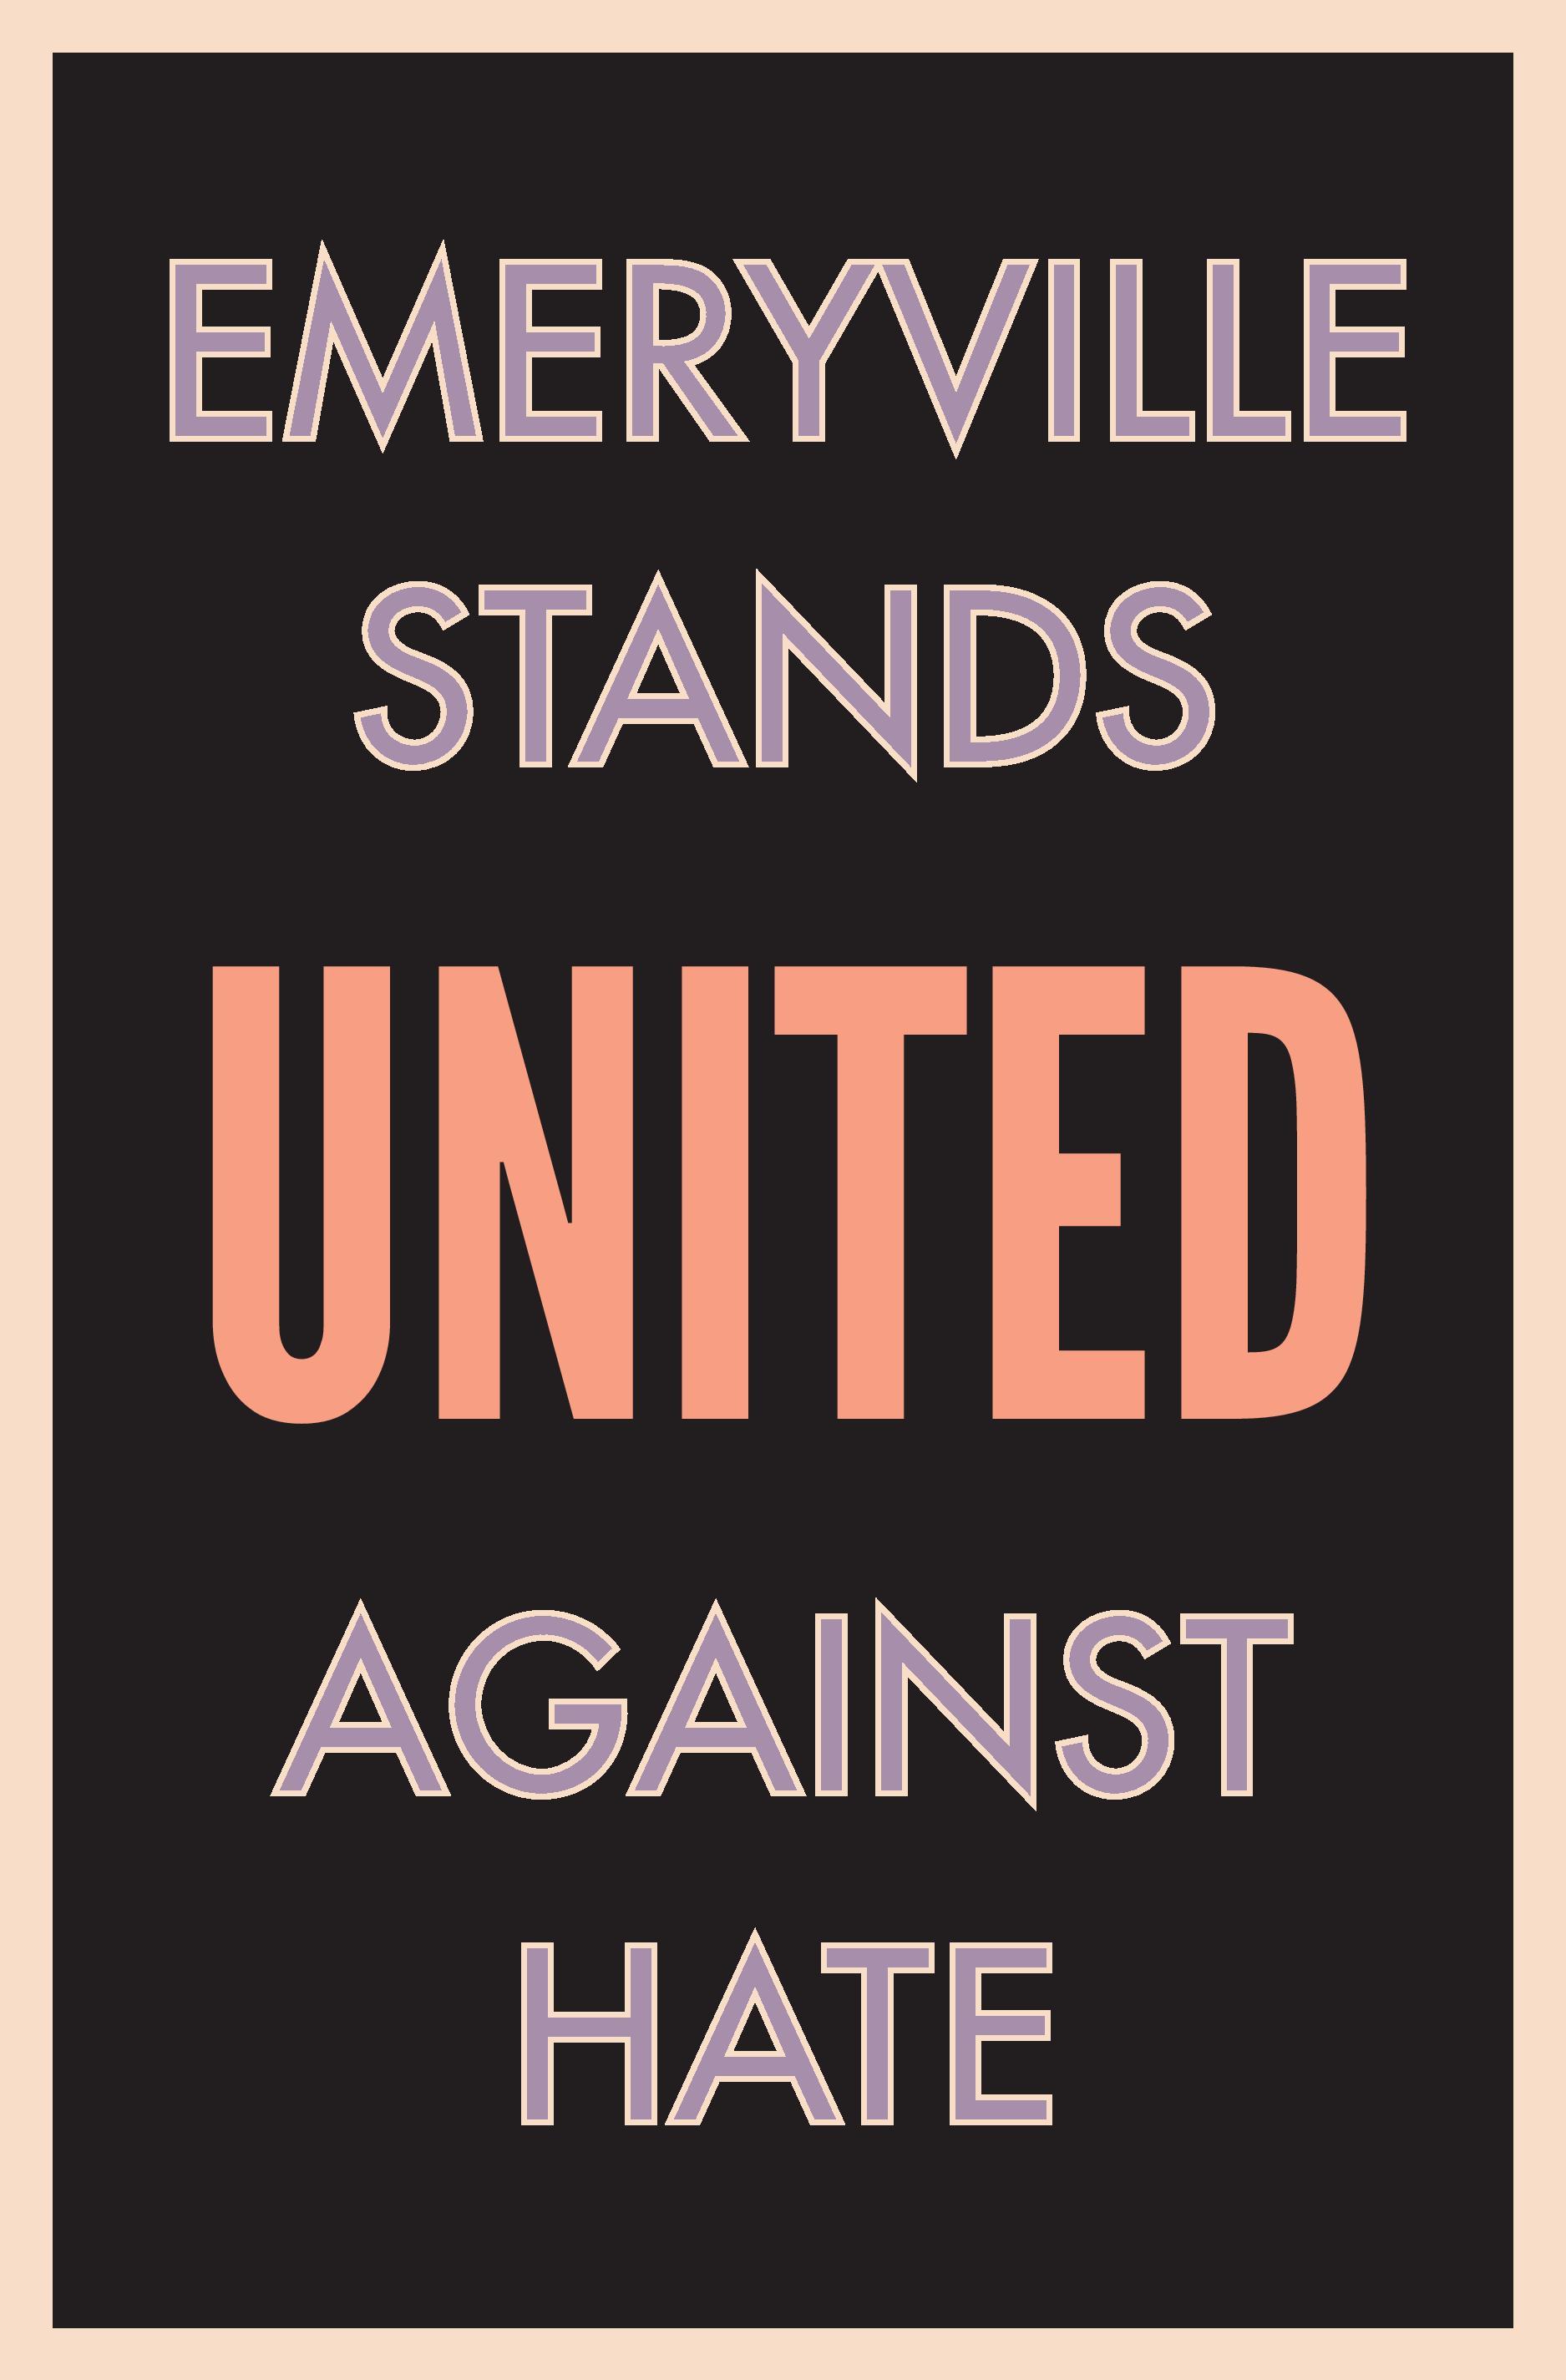 UAH poster Emeryville-page-001.jpg